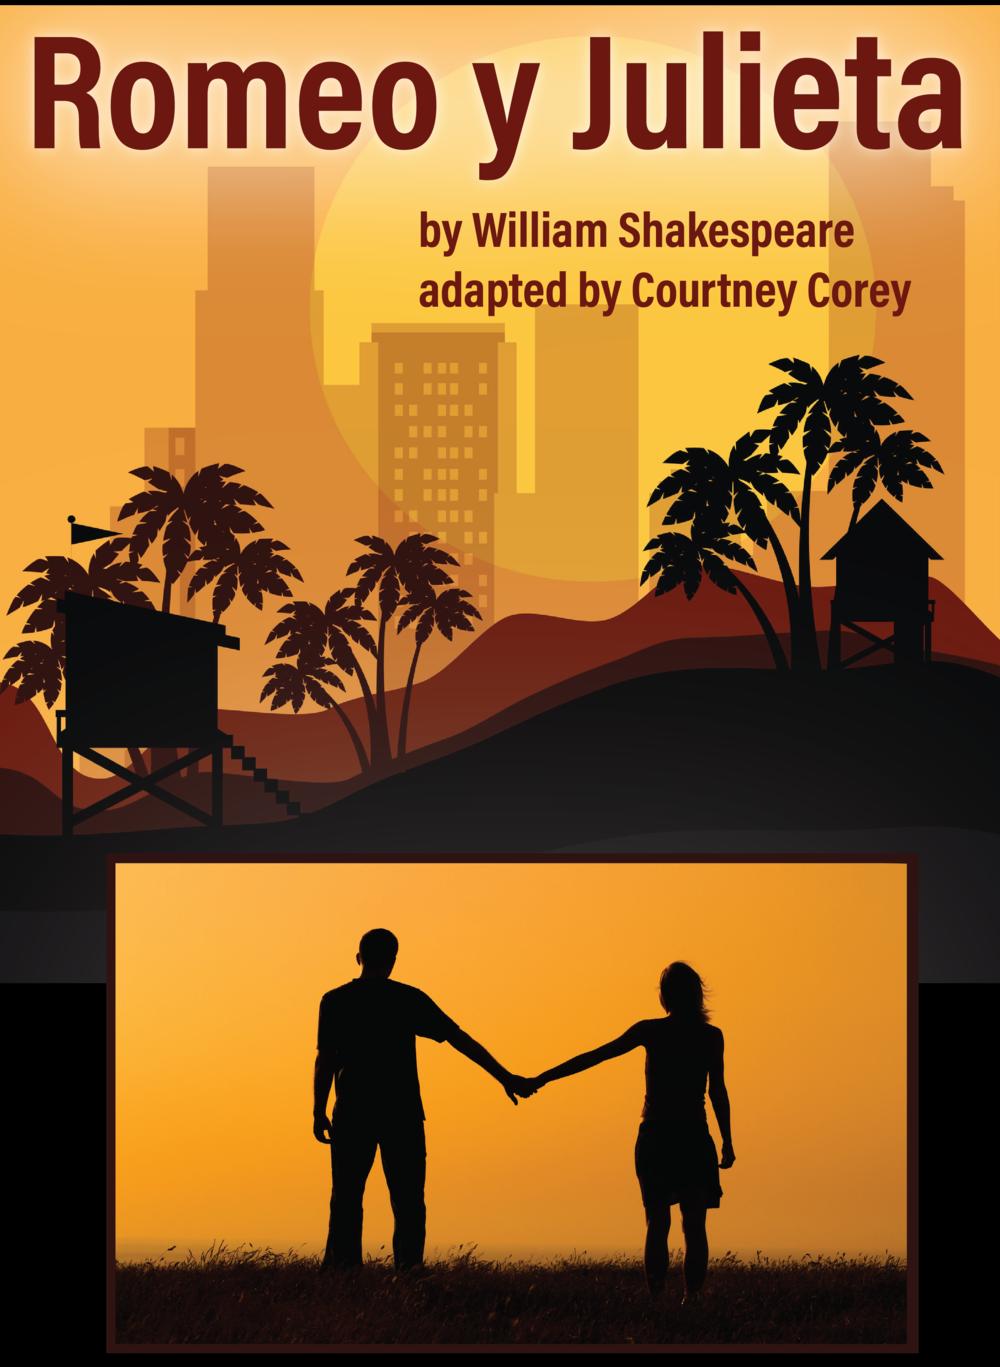 Romeo y Julieta Poster.png